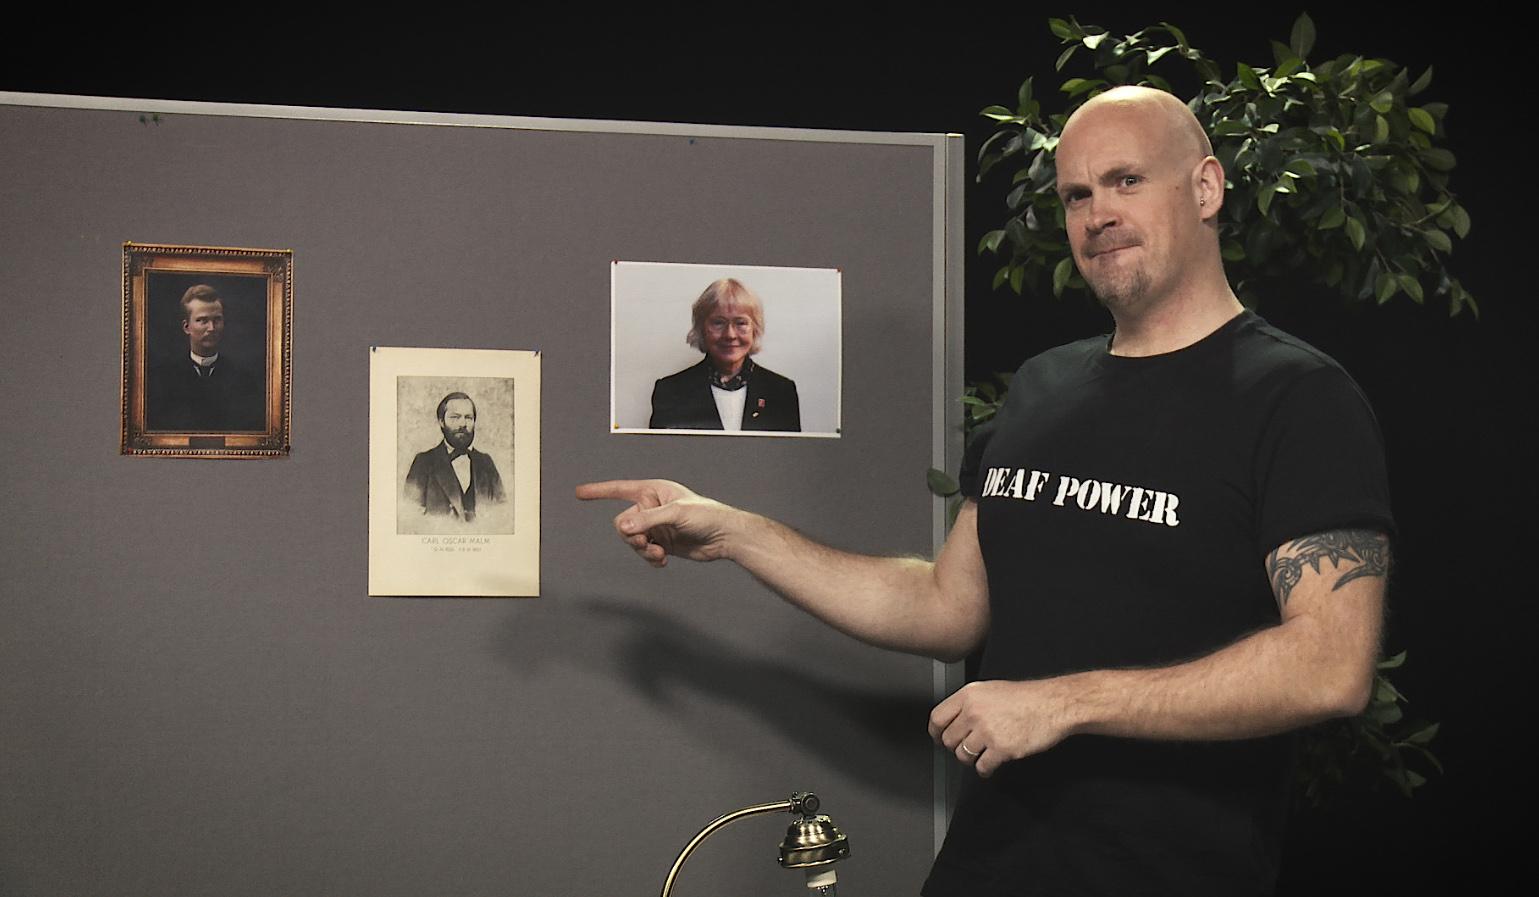 Esiintyjä osoittaa sormella Carl Oscar Malmin kuvaa